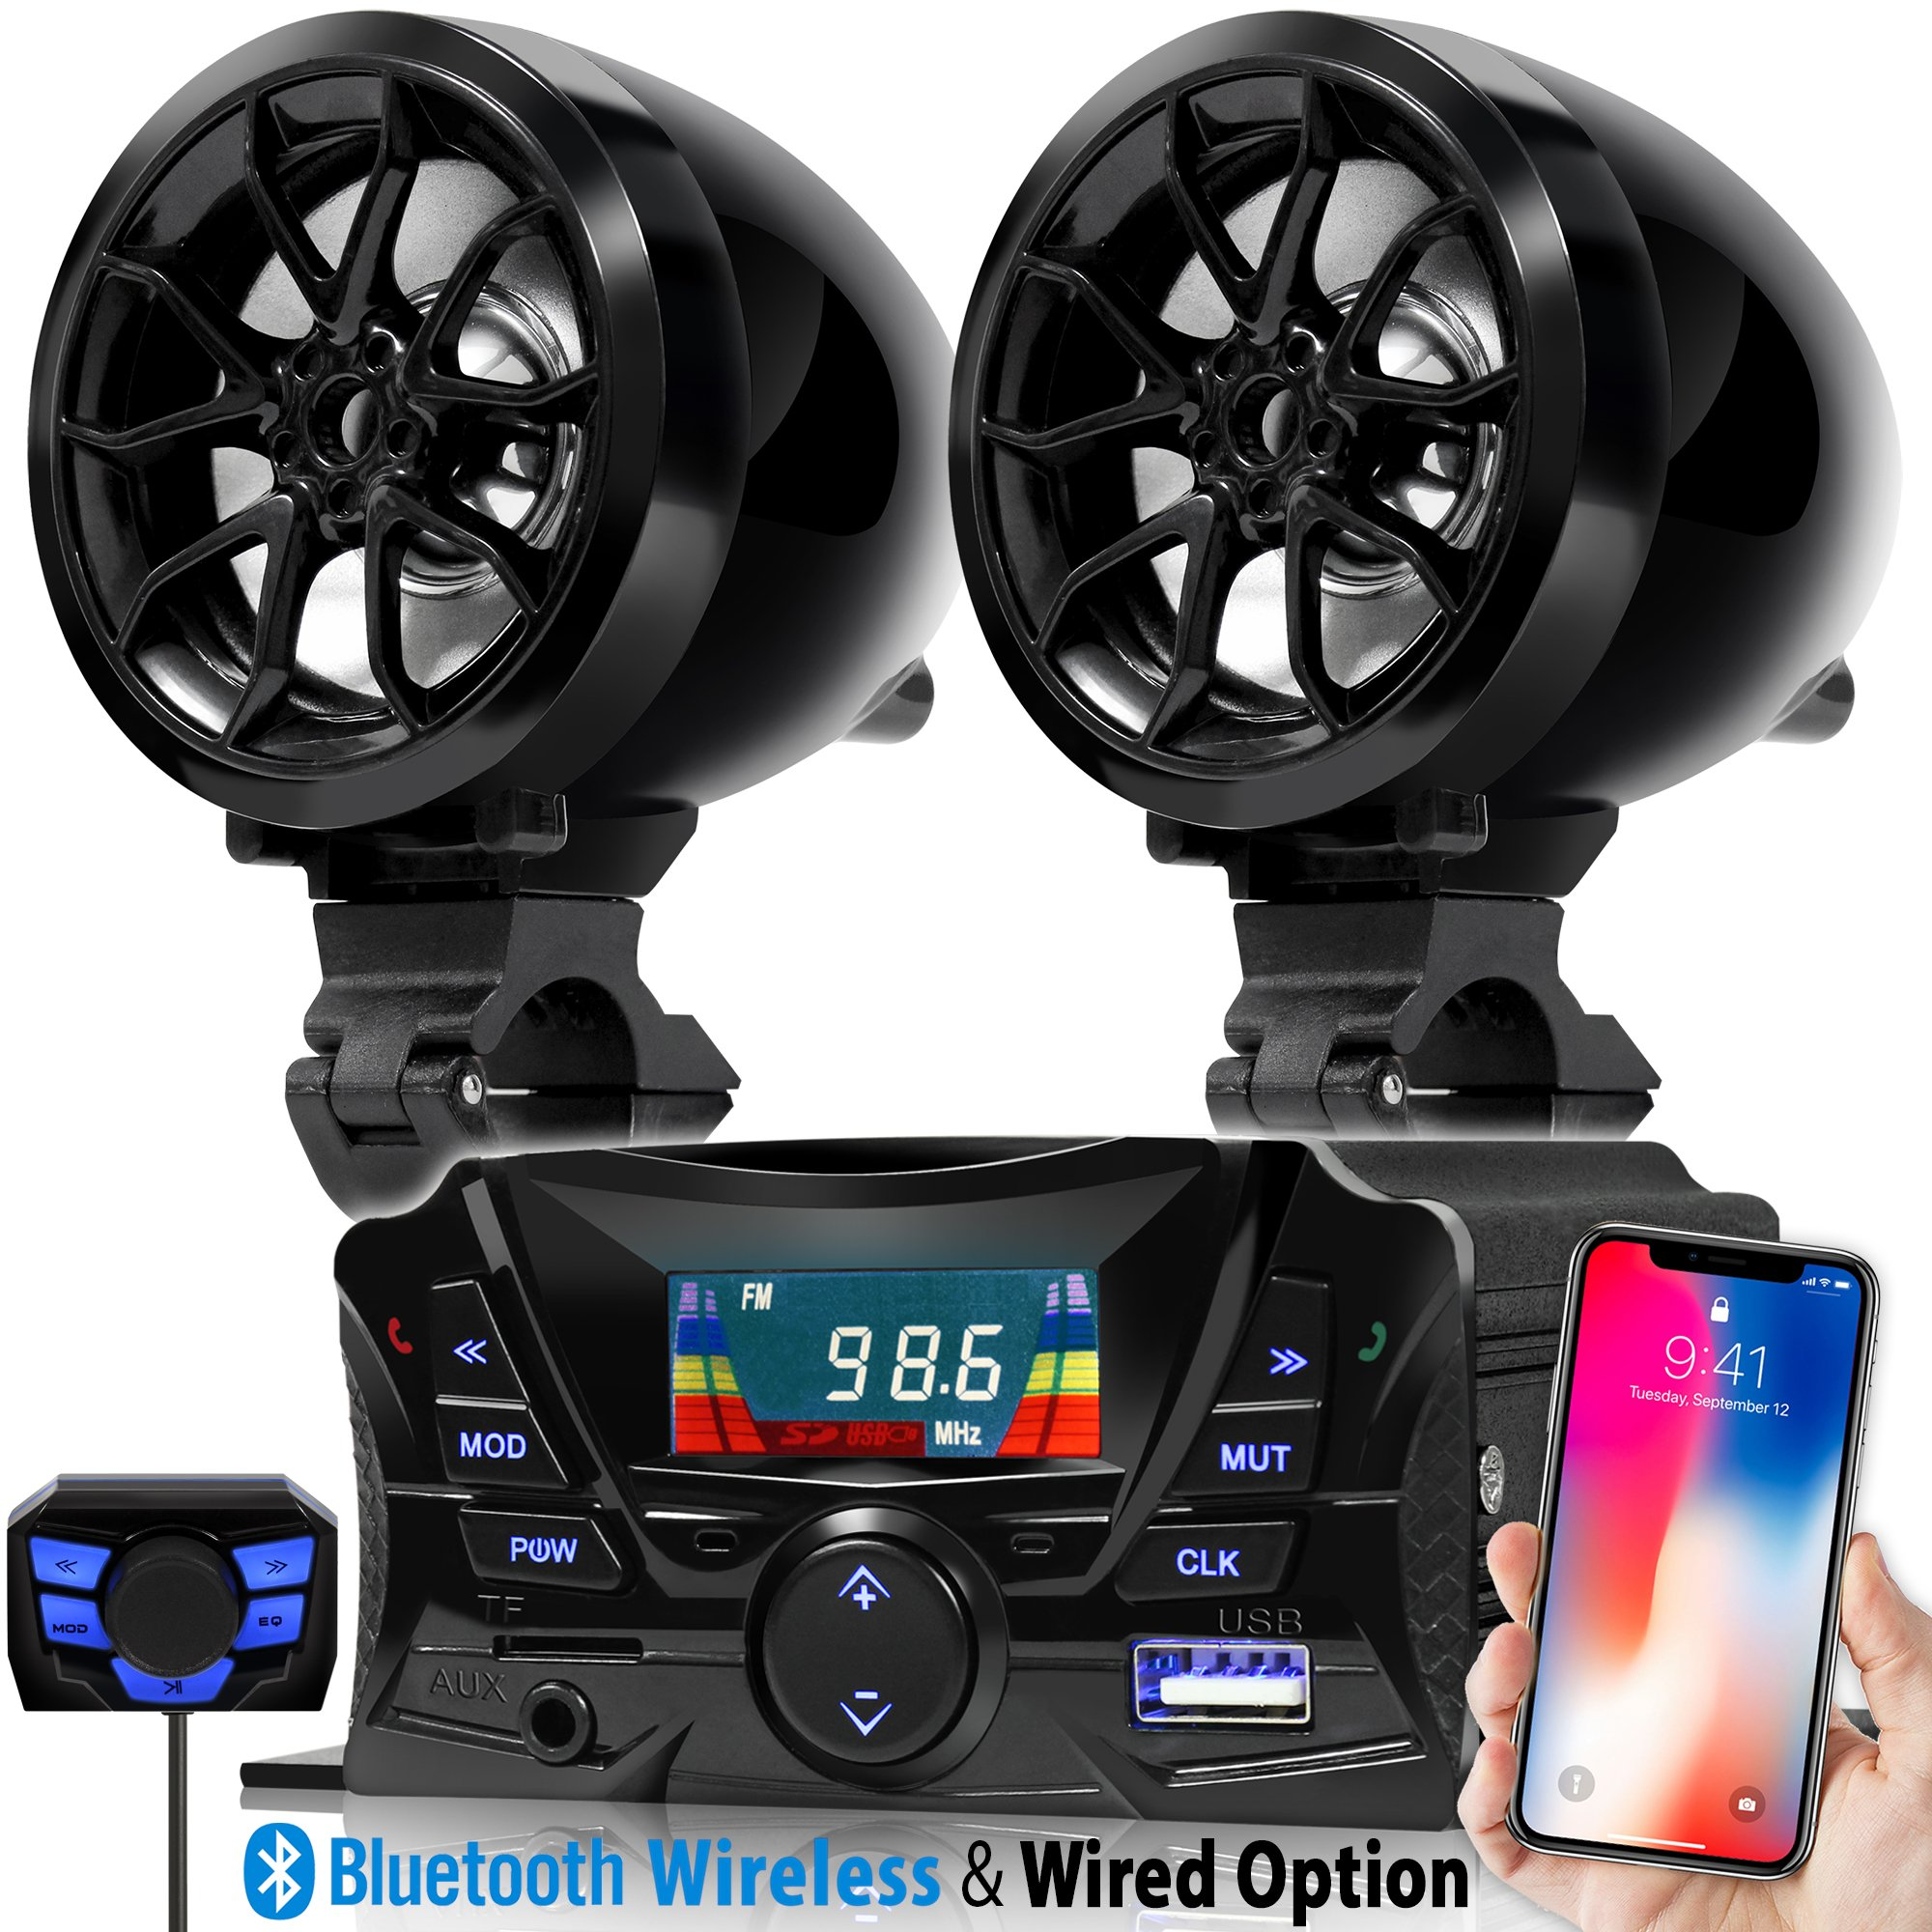 GoldenHawk 3'' Motorcycle Weatherproof Bluetooth Wireless Speaker 7/8-1 in. Handlebar Mount MP3 Music Player Sound Audio Stereo Amplifier System ATV UTV w/ 3.5mm AUX IN, USB 2.0, micro SD, FM Radio